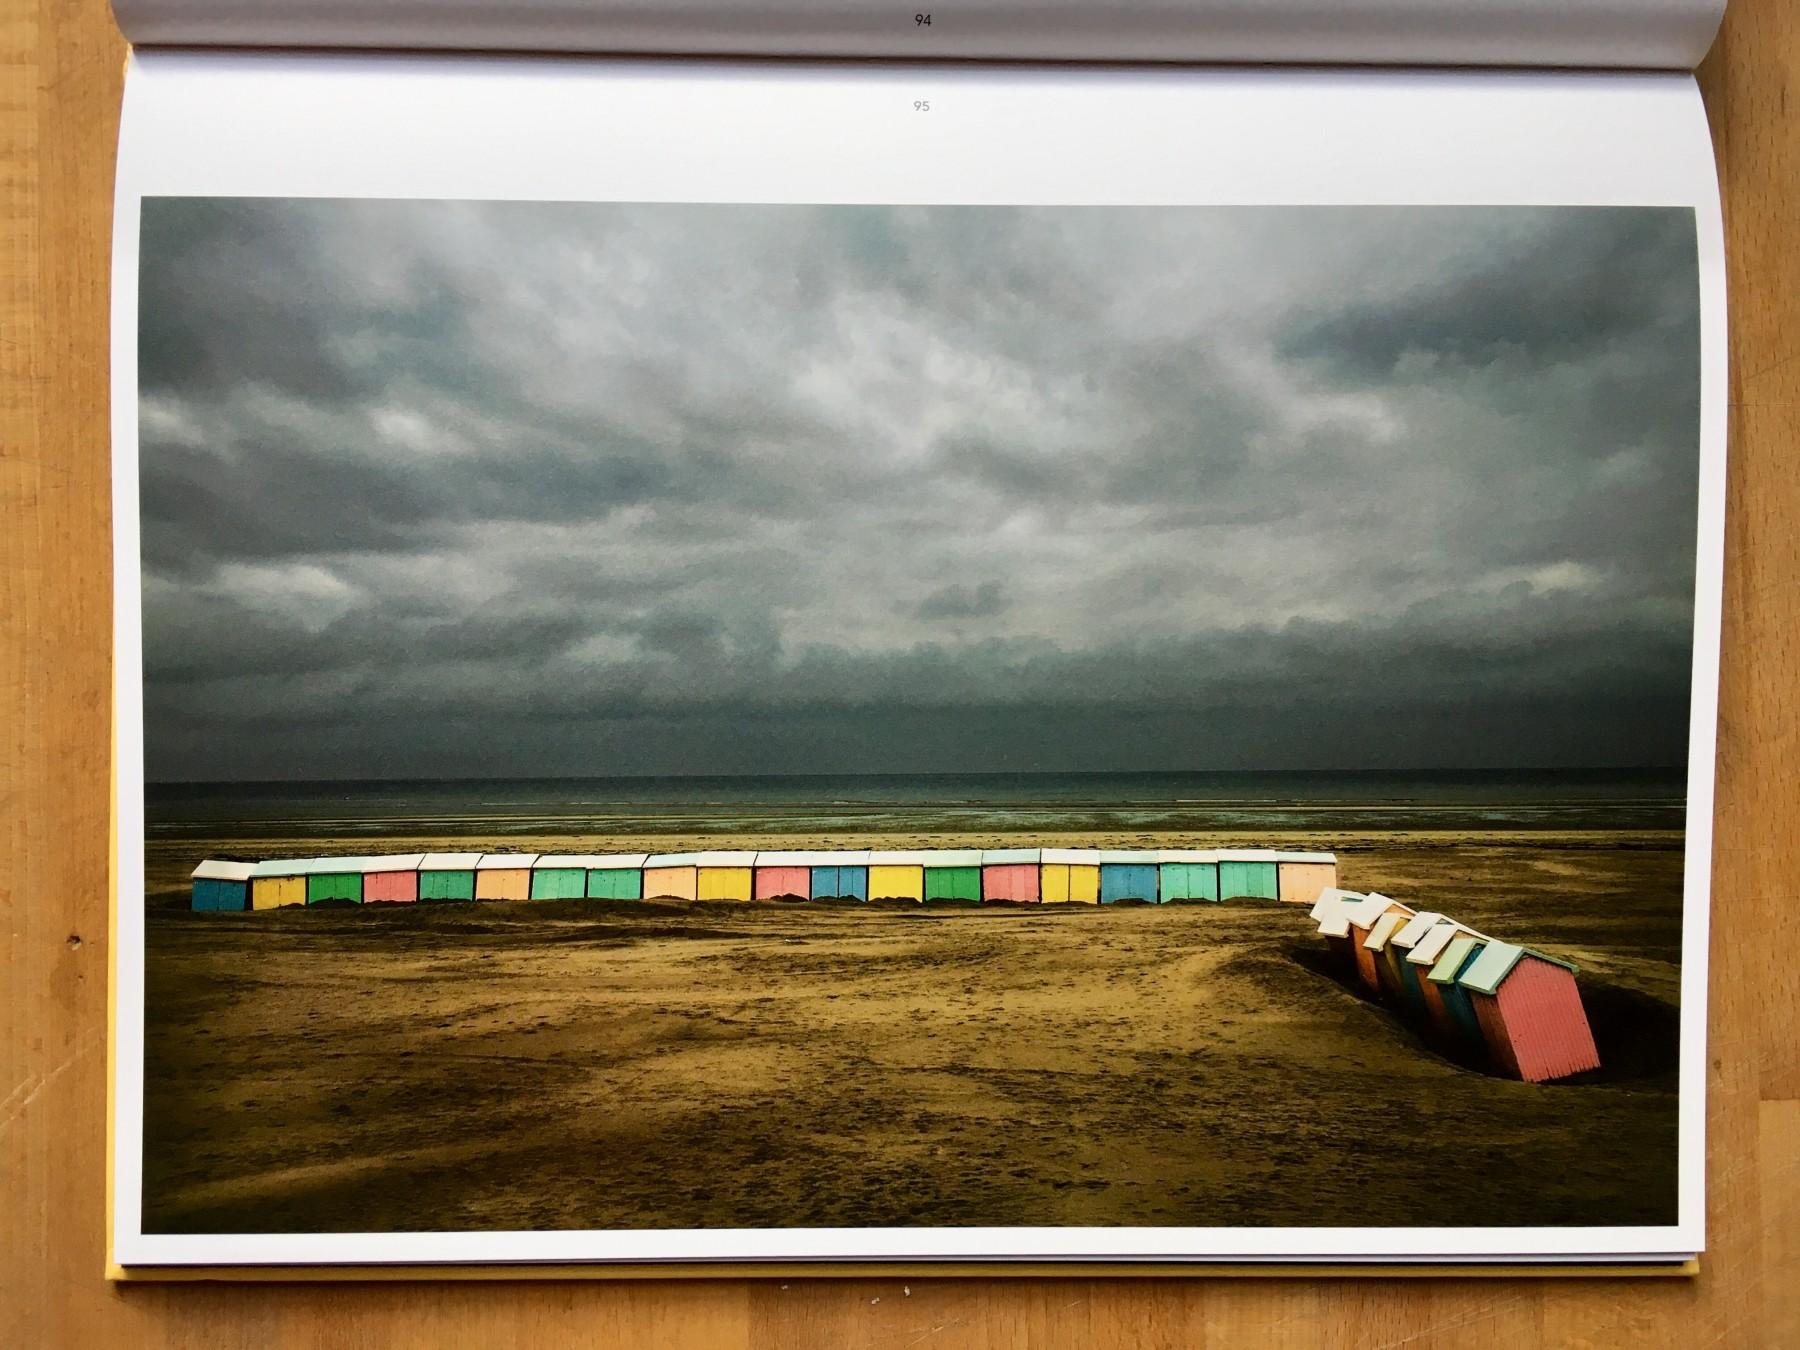 enster-blog-di-cultura-fotografica-harry-gruyaert-rivage-115.JPG